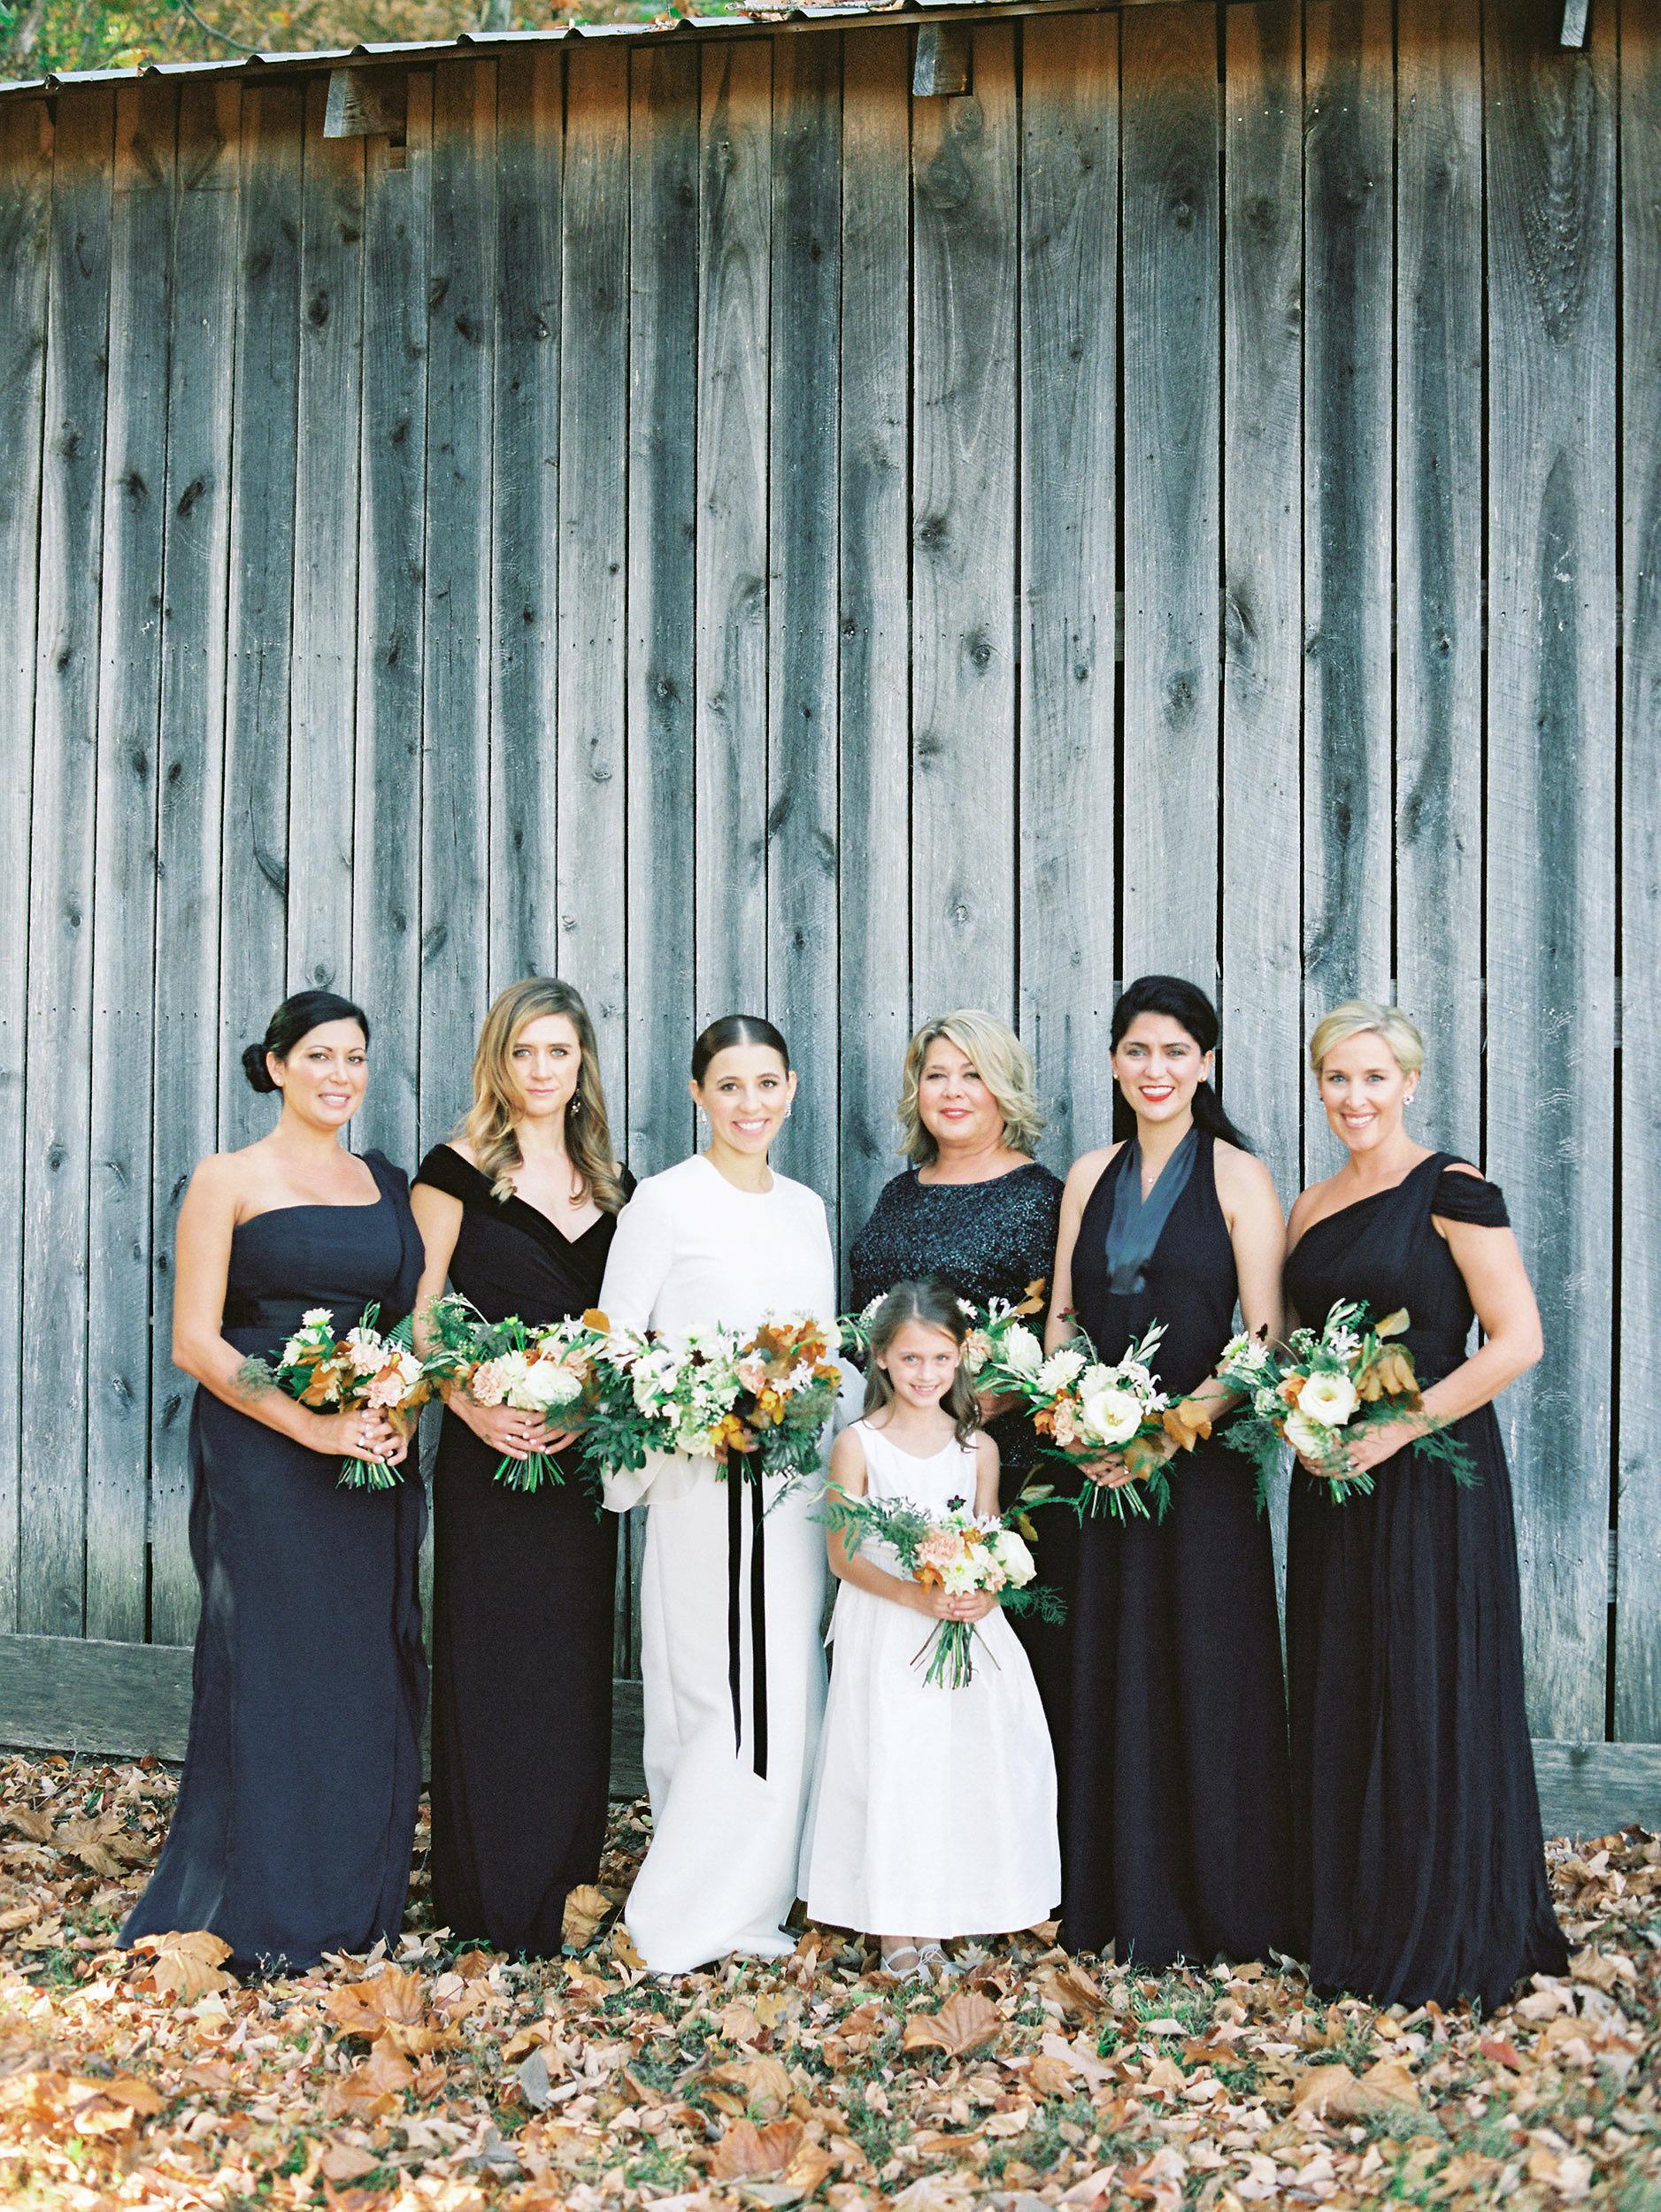 wedding bridesmaids black dresses